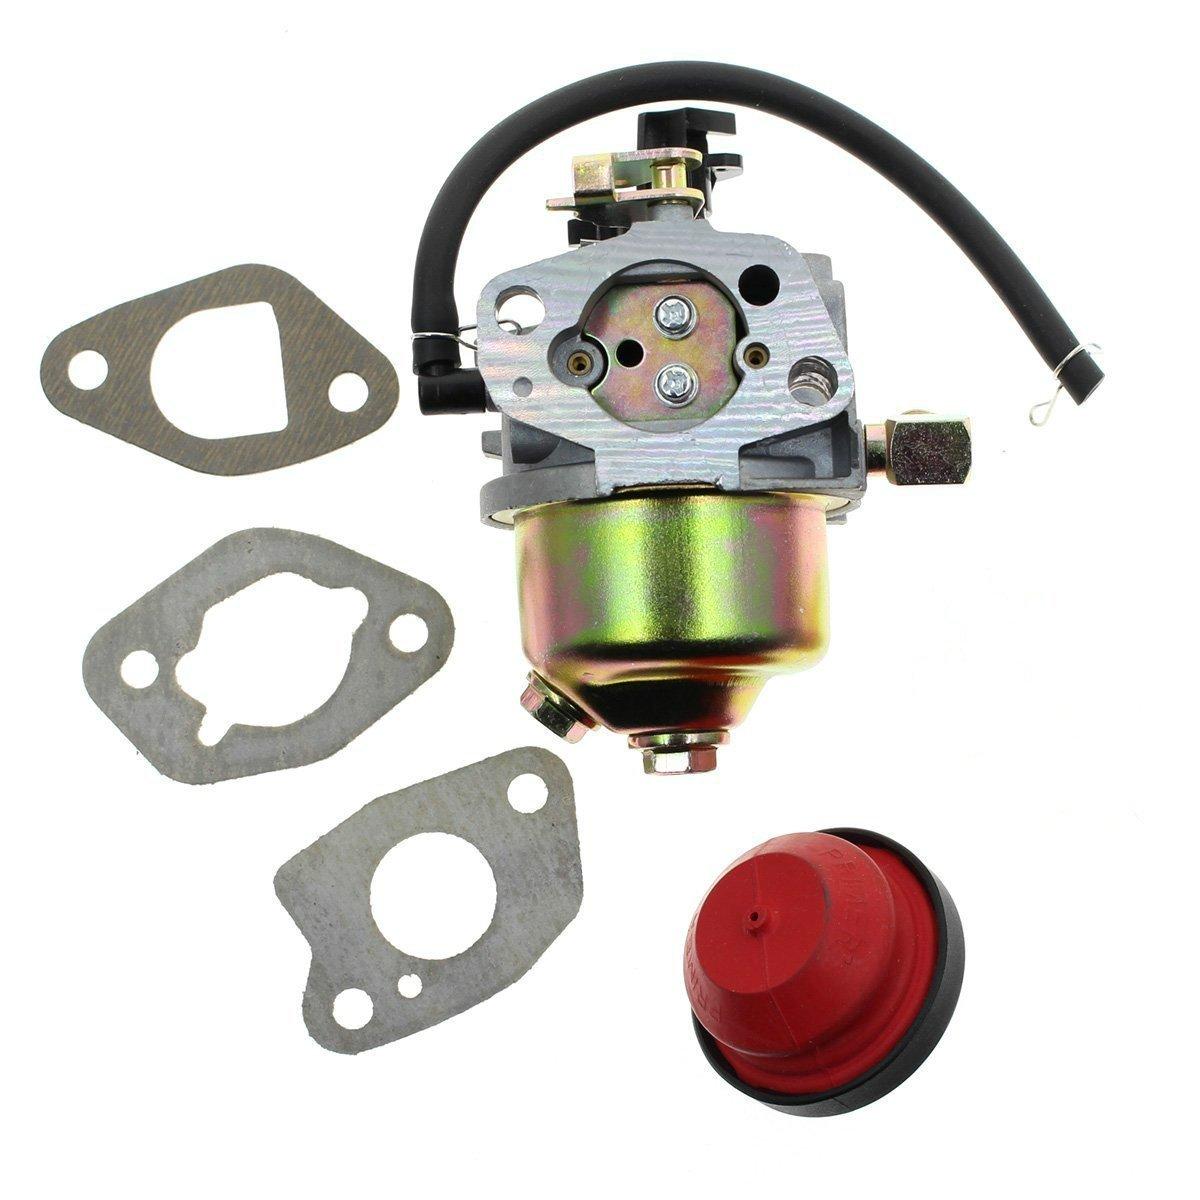 Carburetor for MTD Troy Bilt Cub Cadet Snow Blower 951-10974/951-10974A/951-12705 JEM&JULES